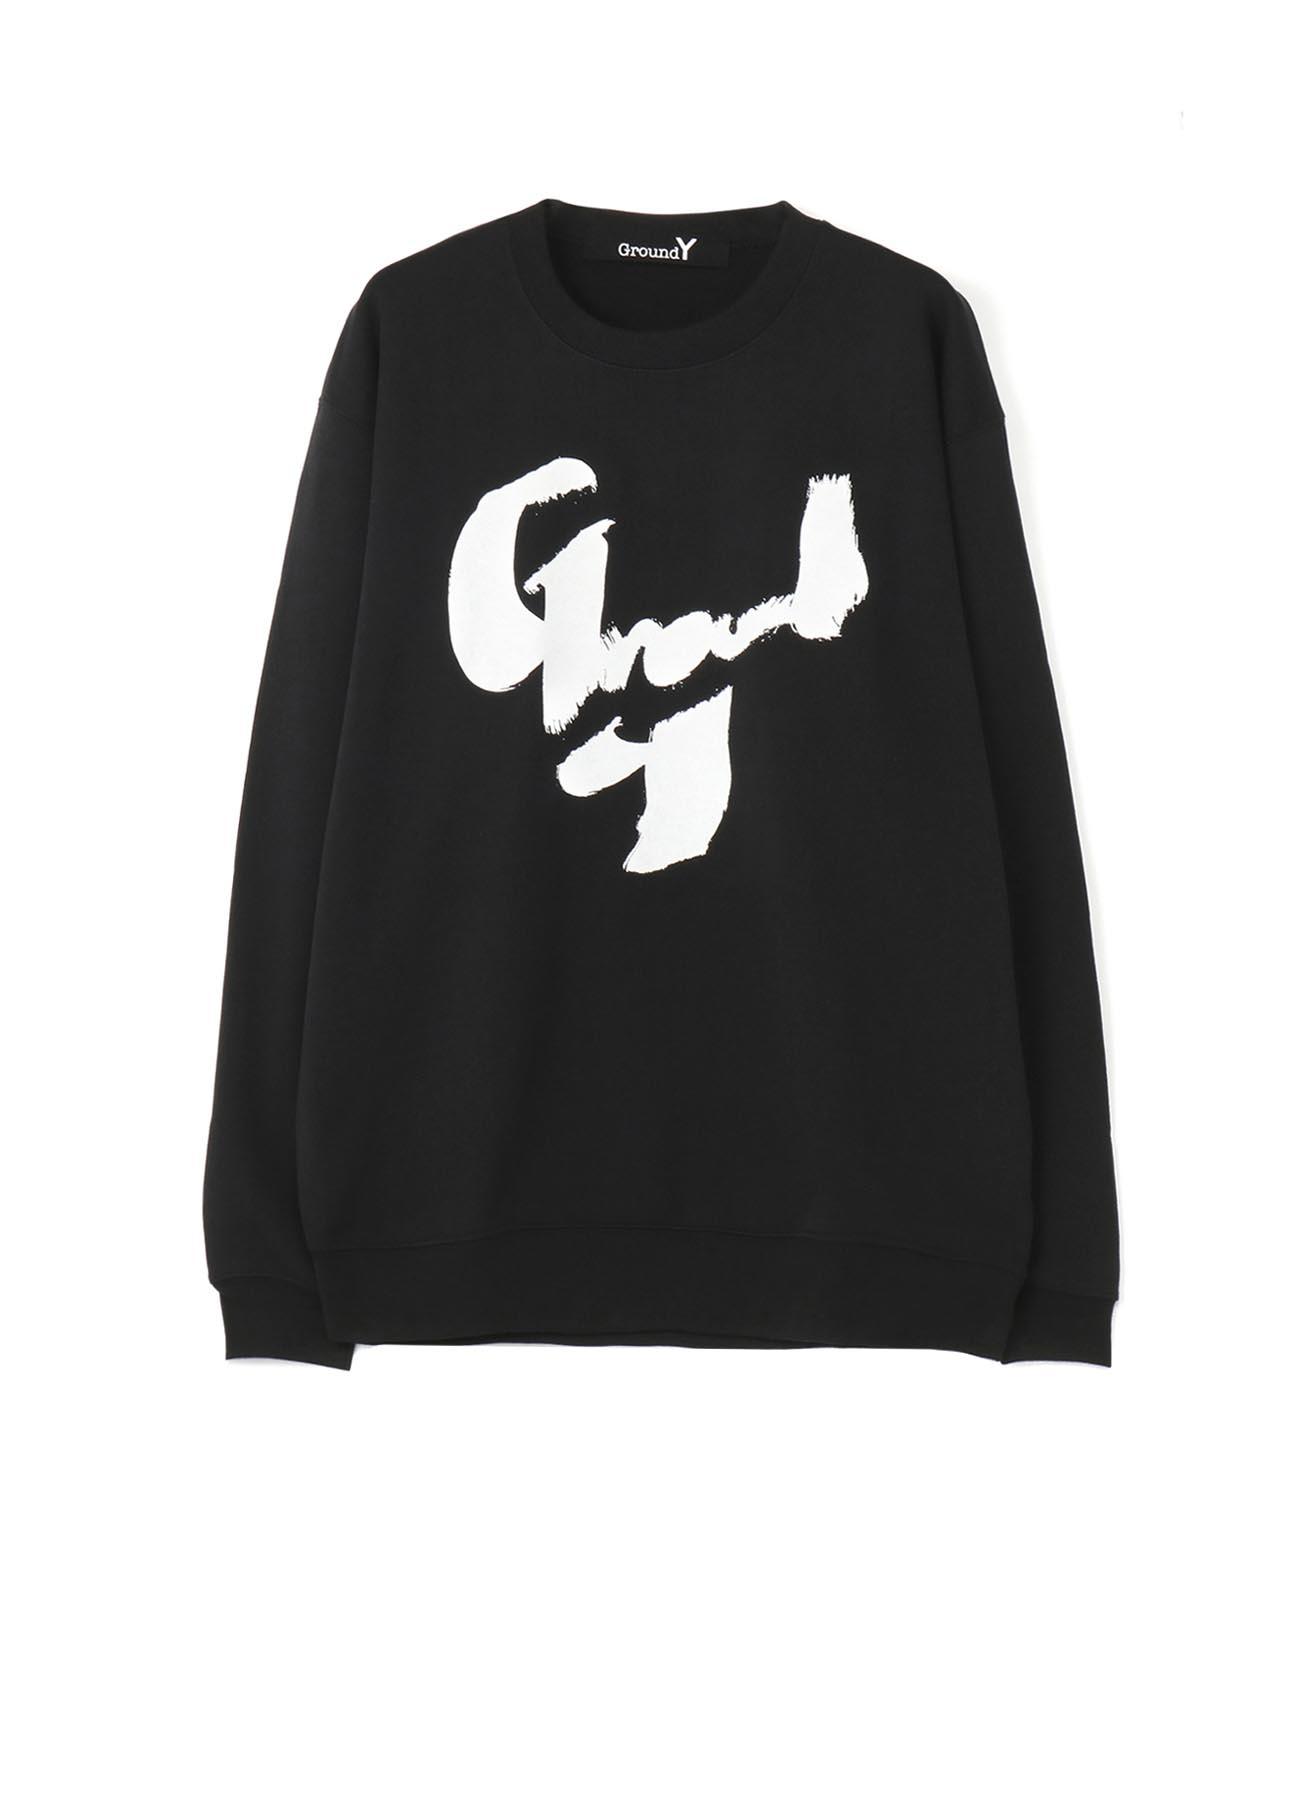 手绘GroundY logo图形运动衫